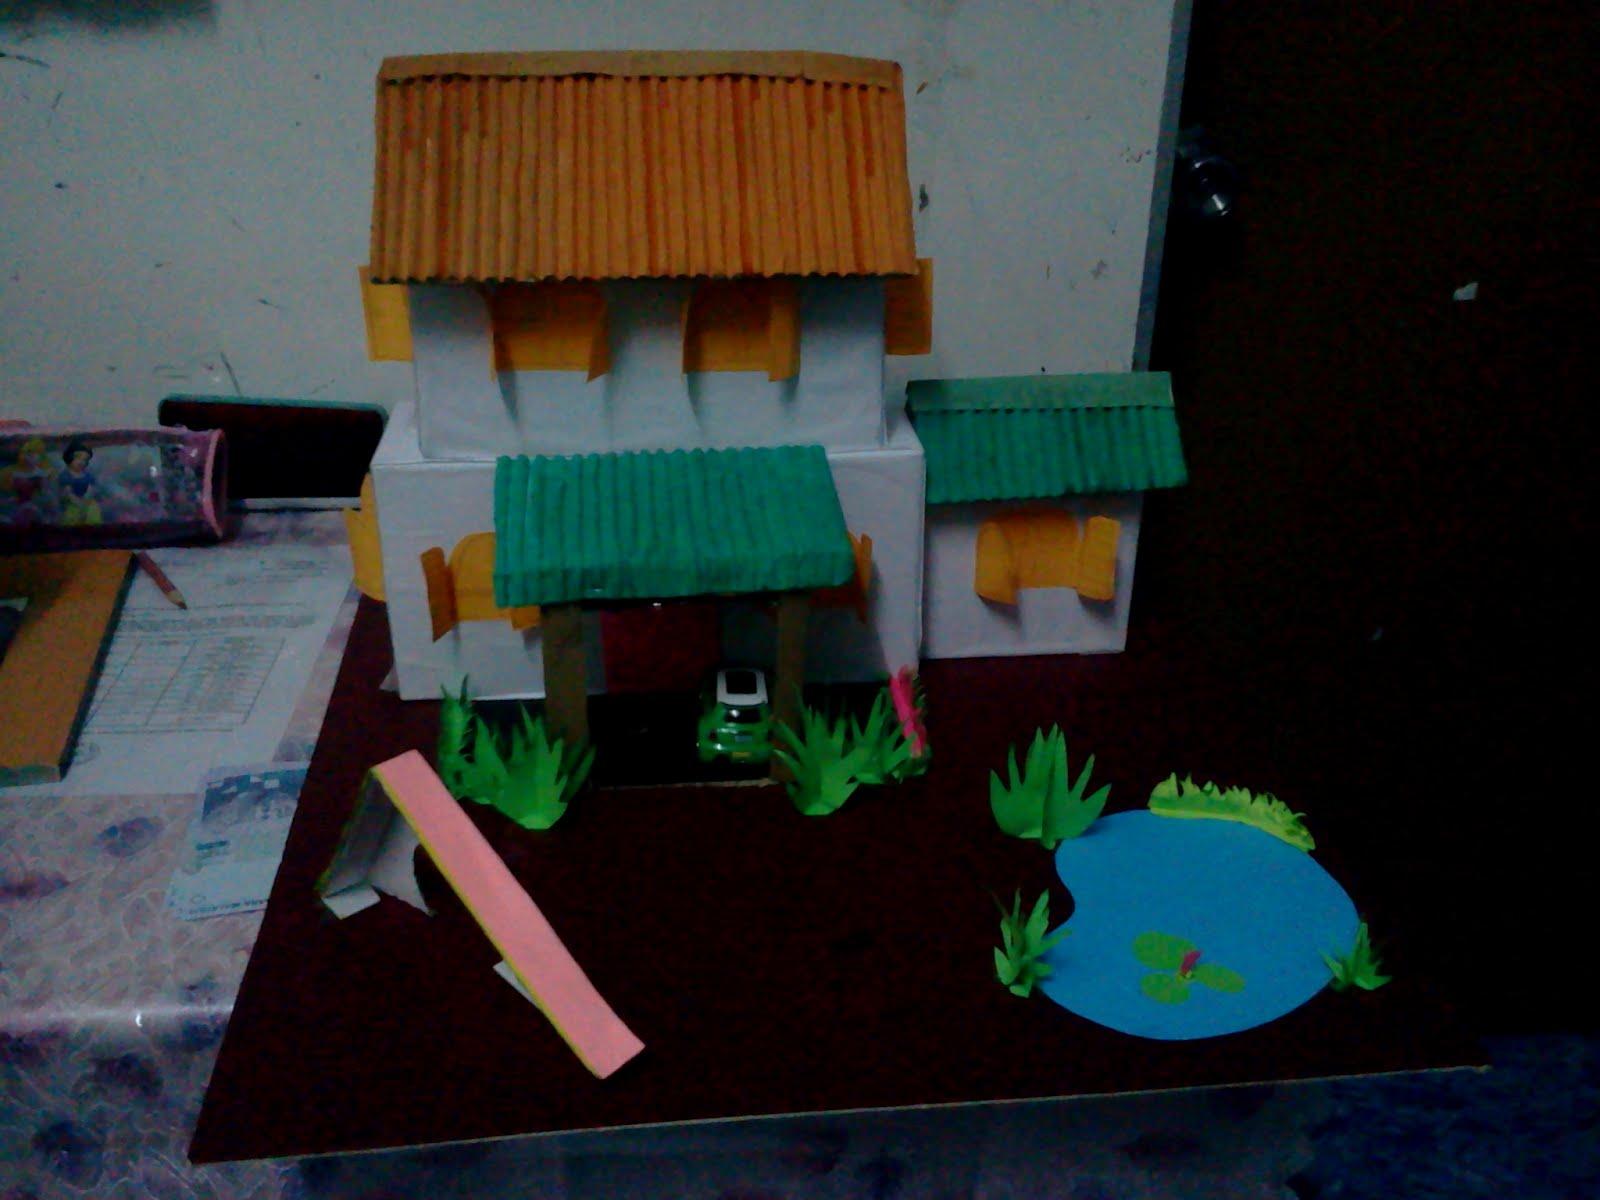 Projek Rumah Iqa Finalized